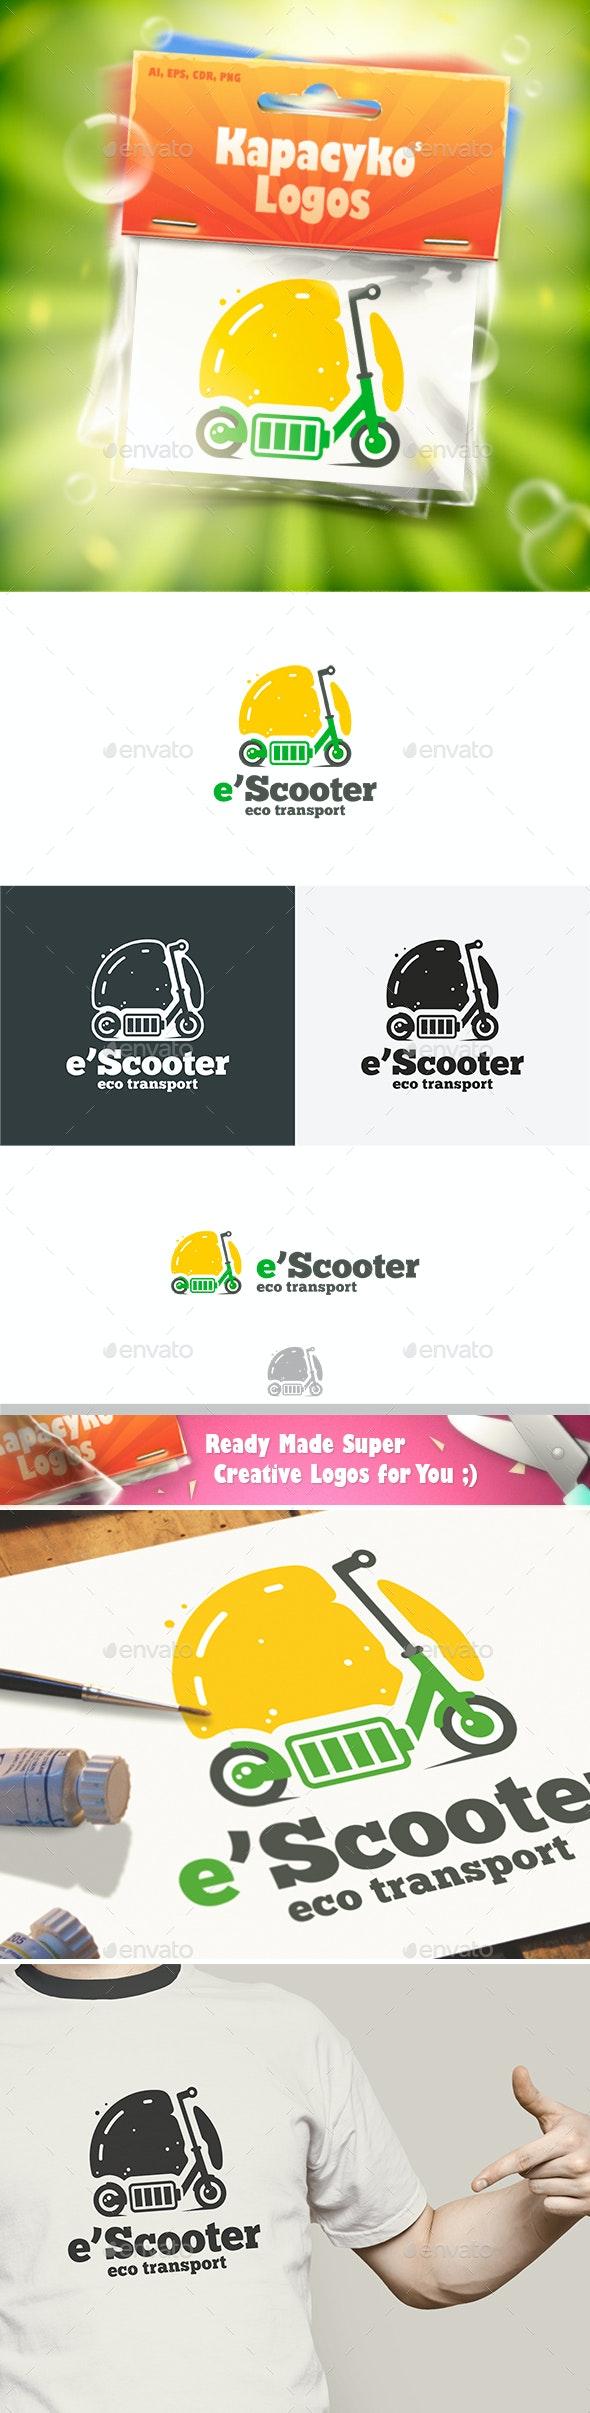 Electric Scooter Logo - Symbols Logo Templates